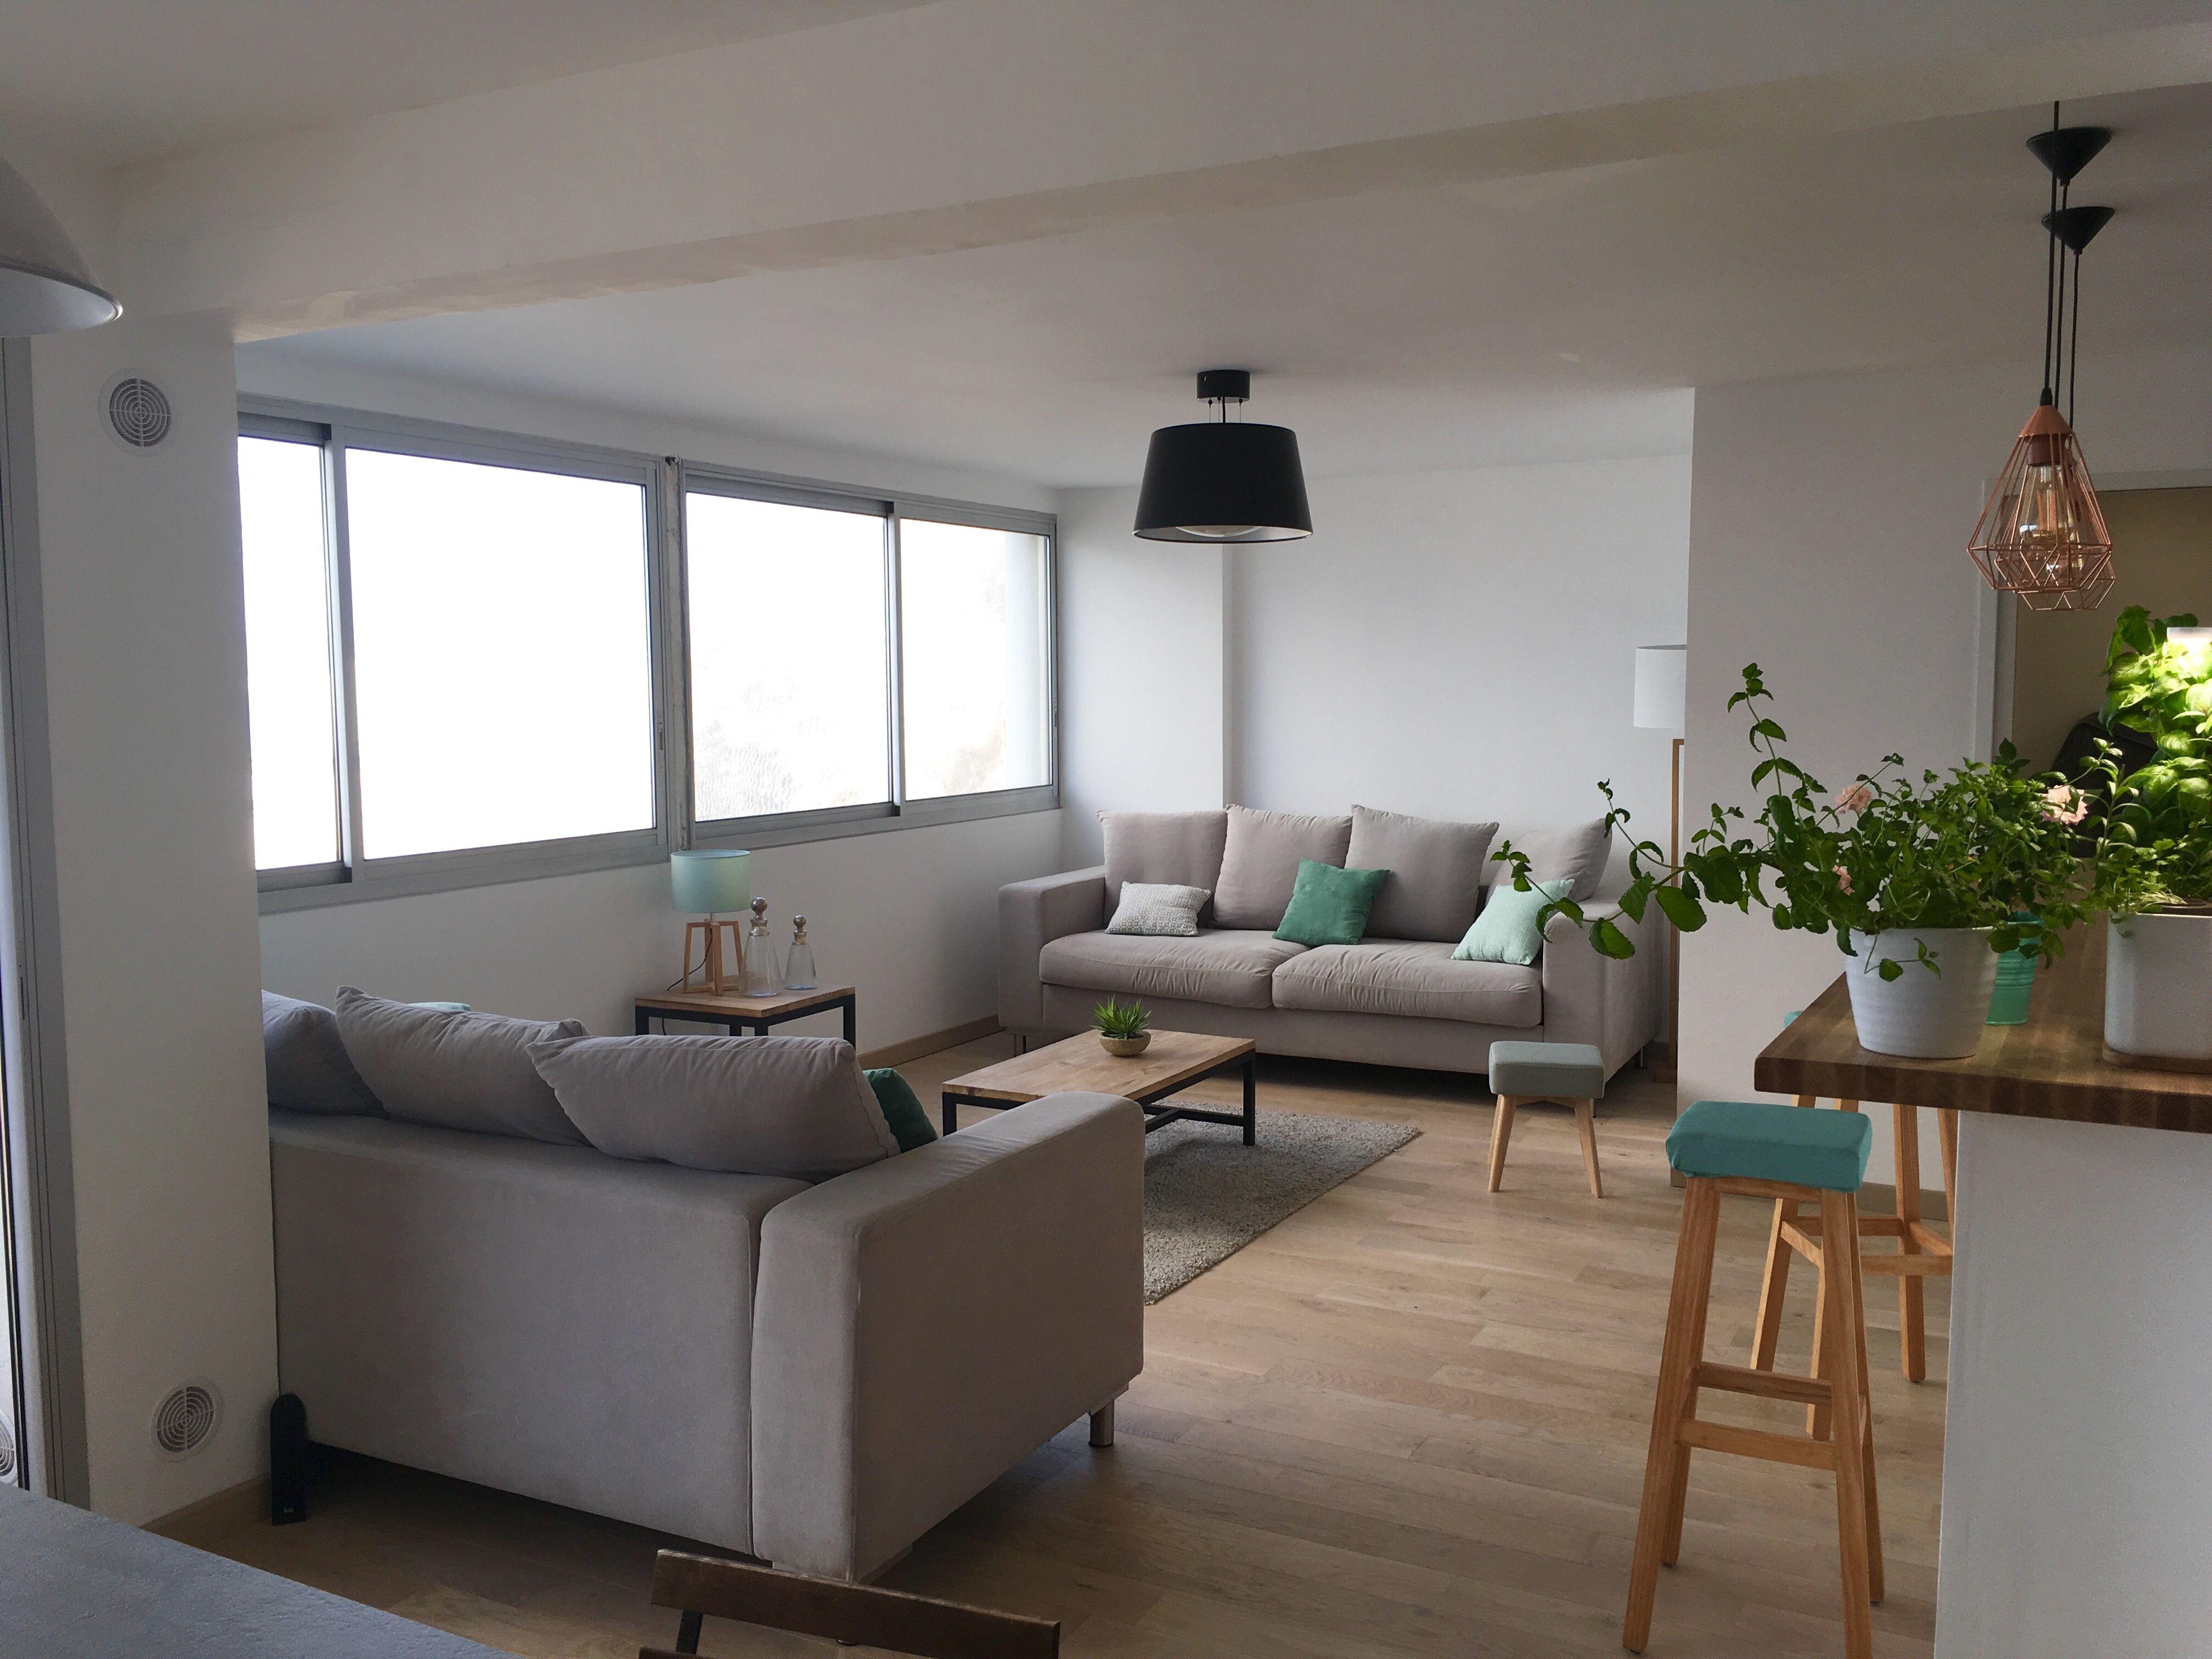 HD wallpapers salon moderne italiane sweet-love-wallpaper.qgr.pw